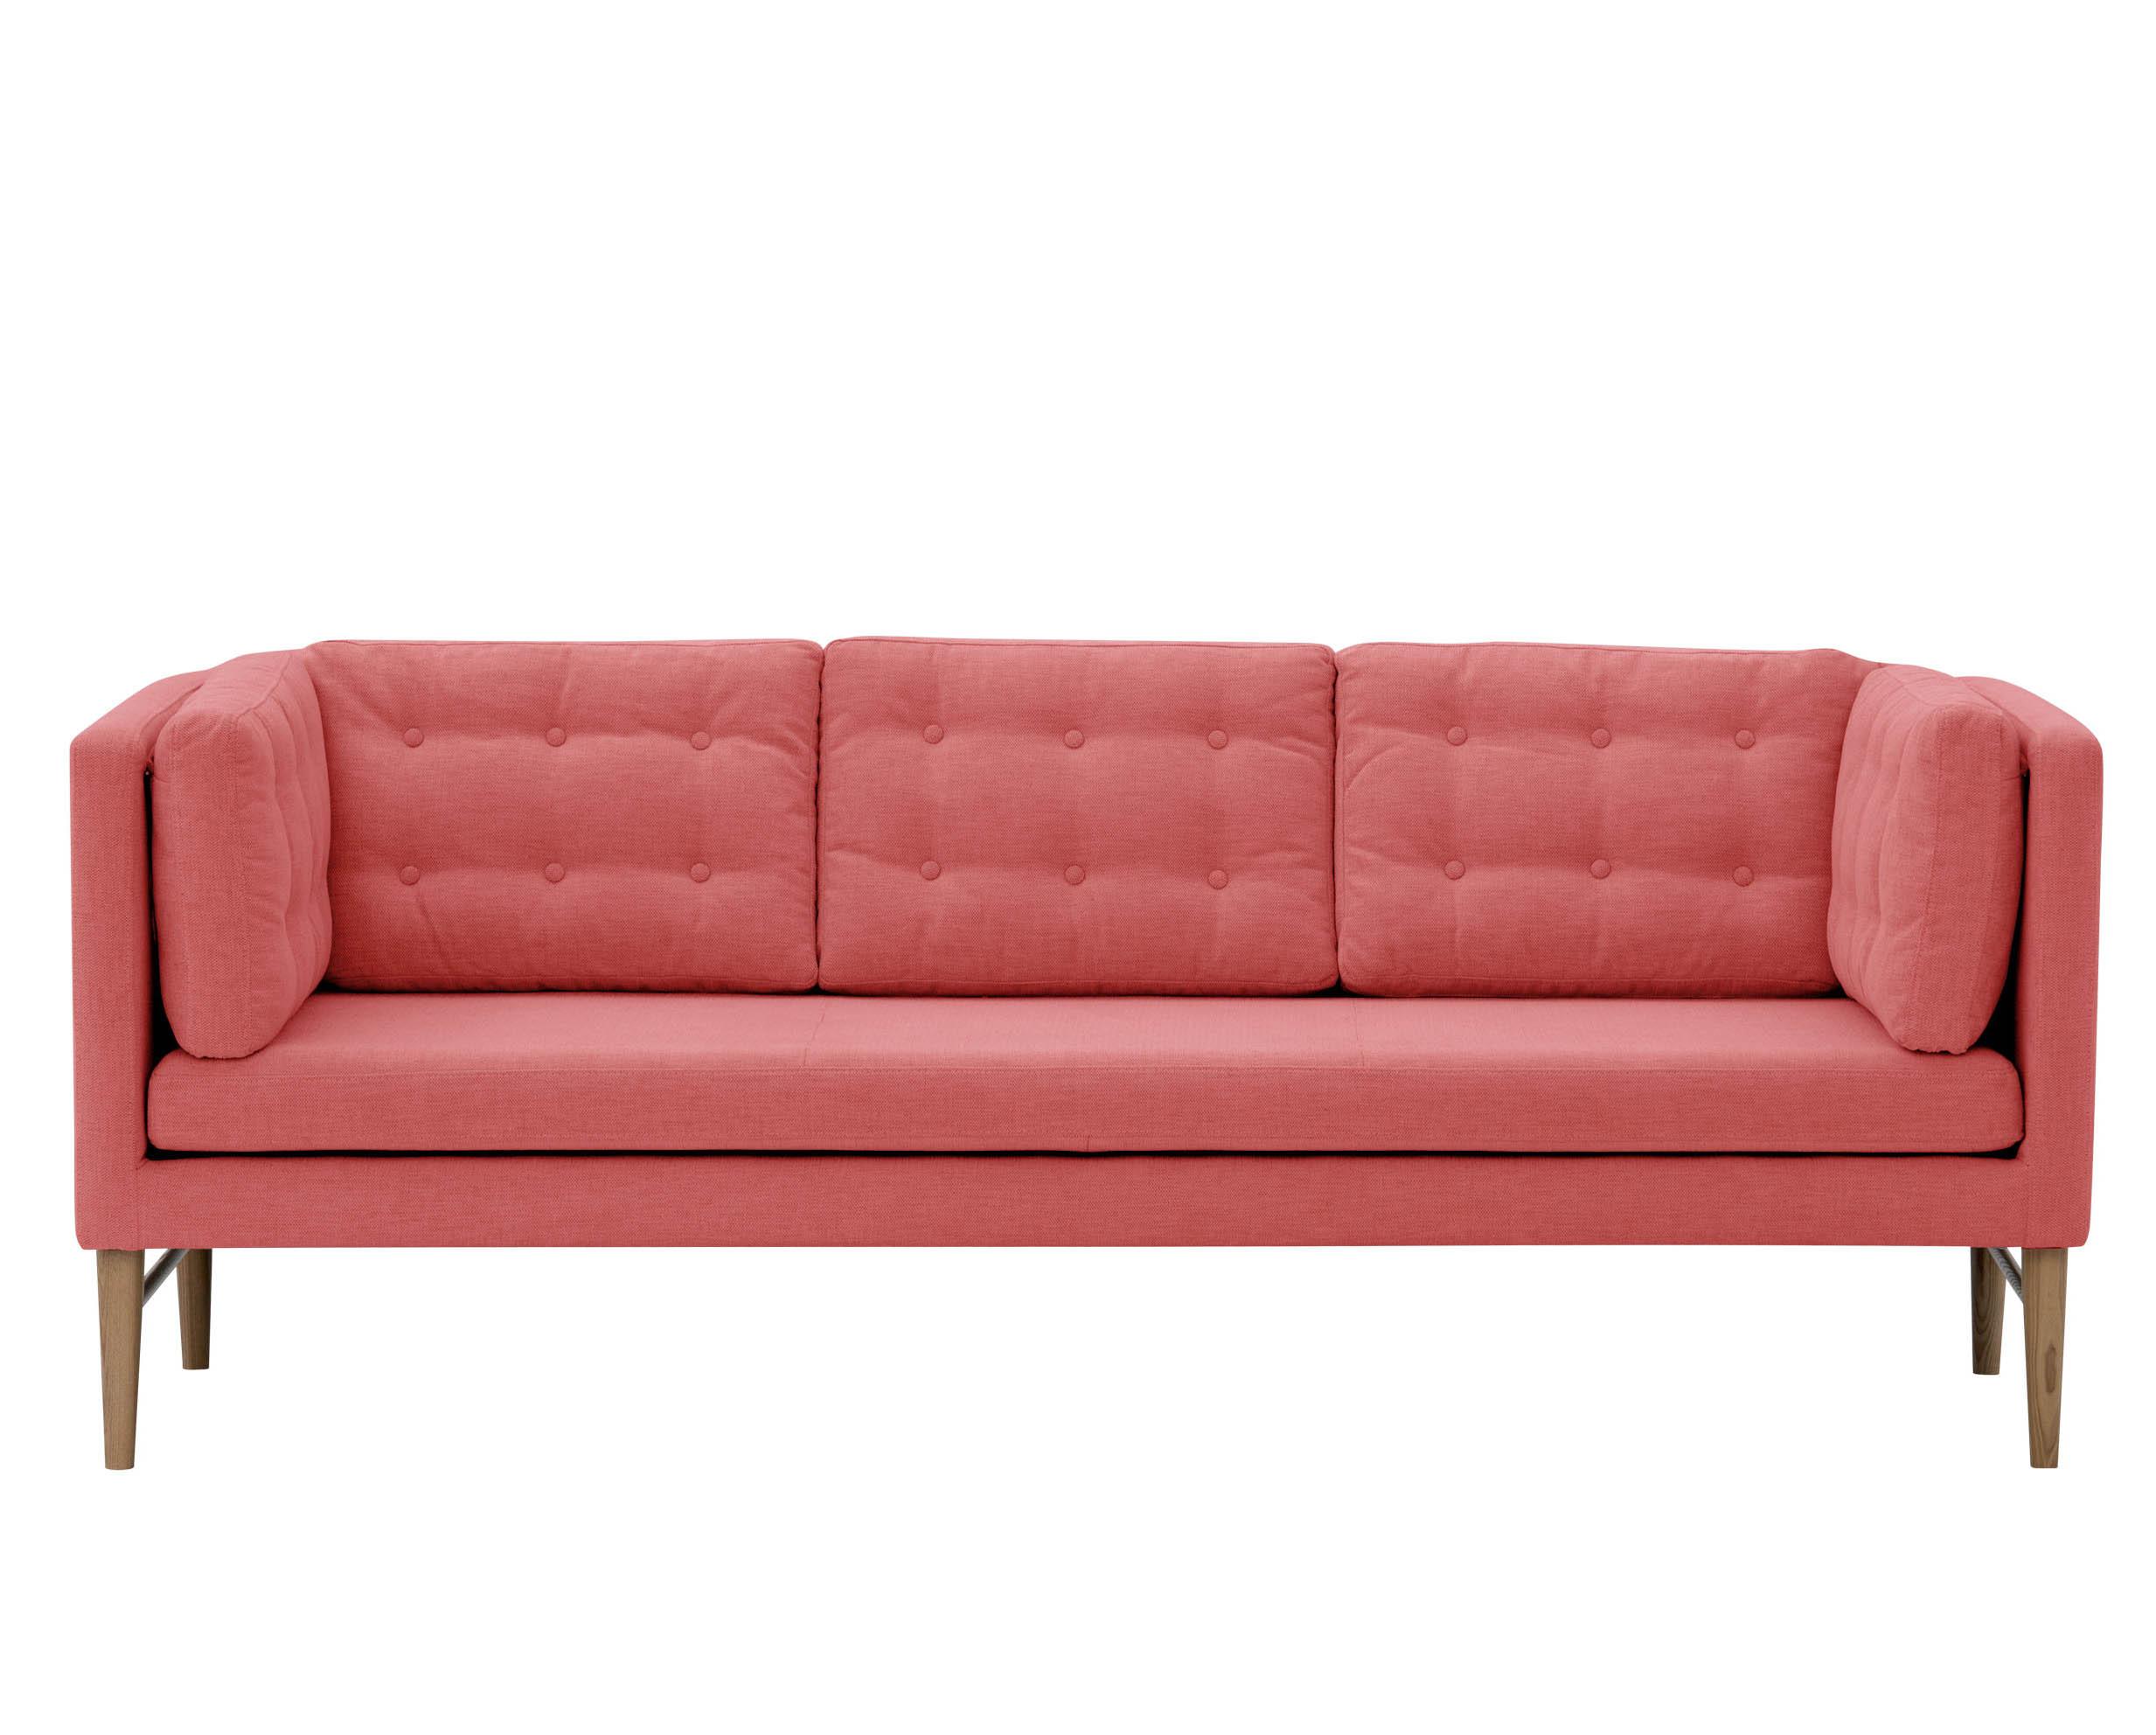 journelles maison fashionforhome sofa tesoro pink journelles. Black Bedroom Furniture Sets. Home Design Ideas